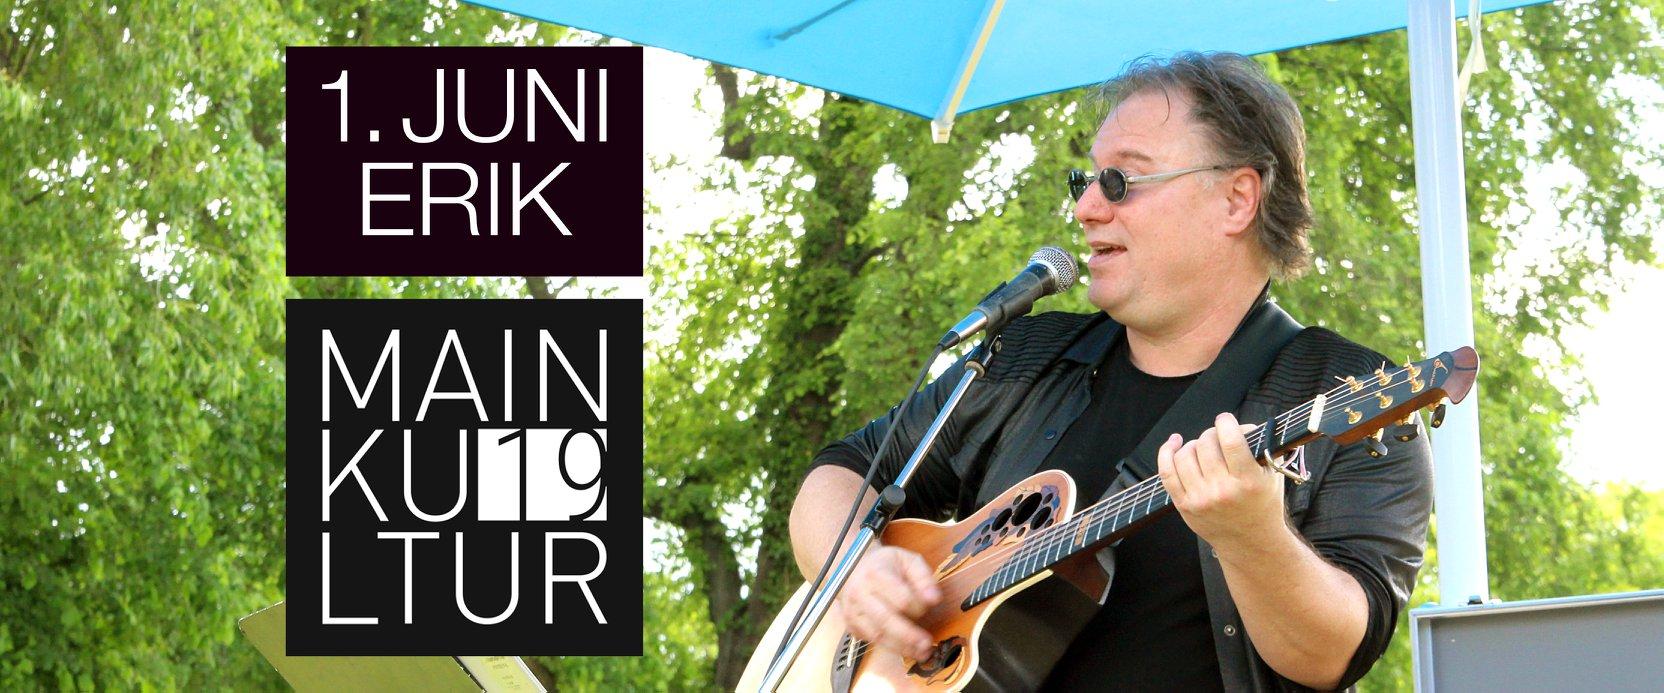 Erik live bei Mainkultur Maintal am 1. Juni 2019